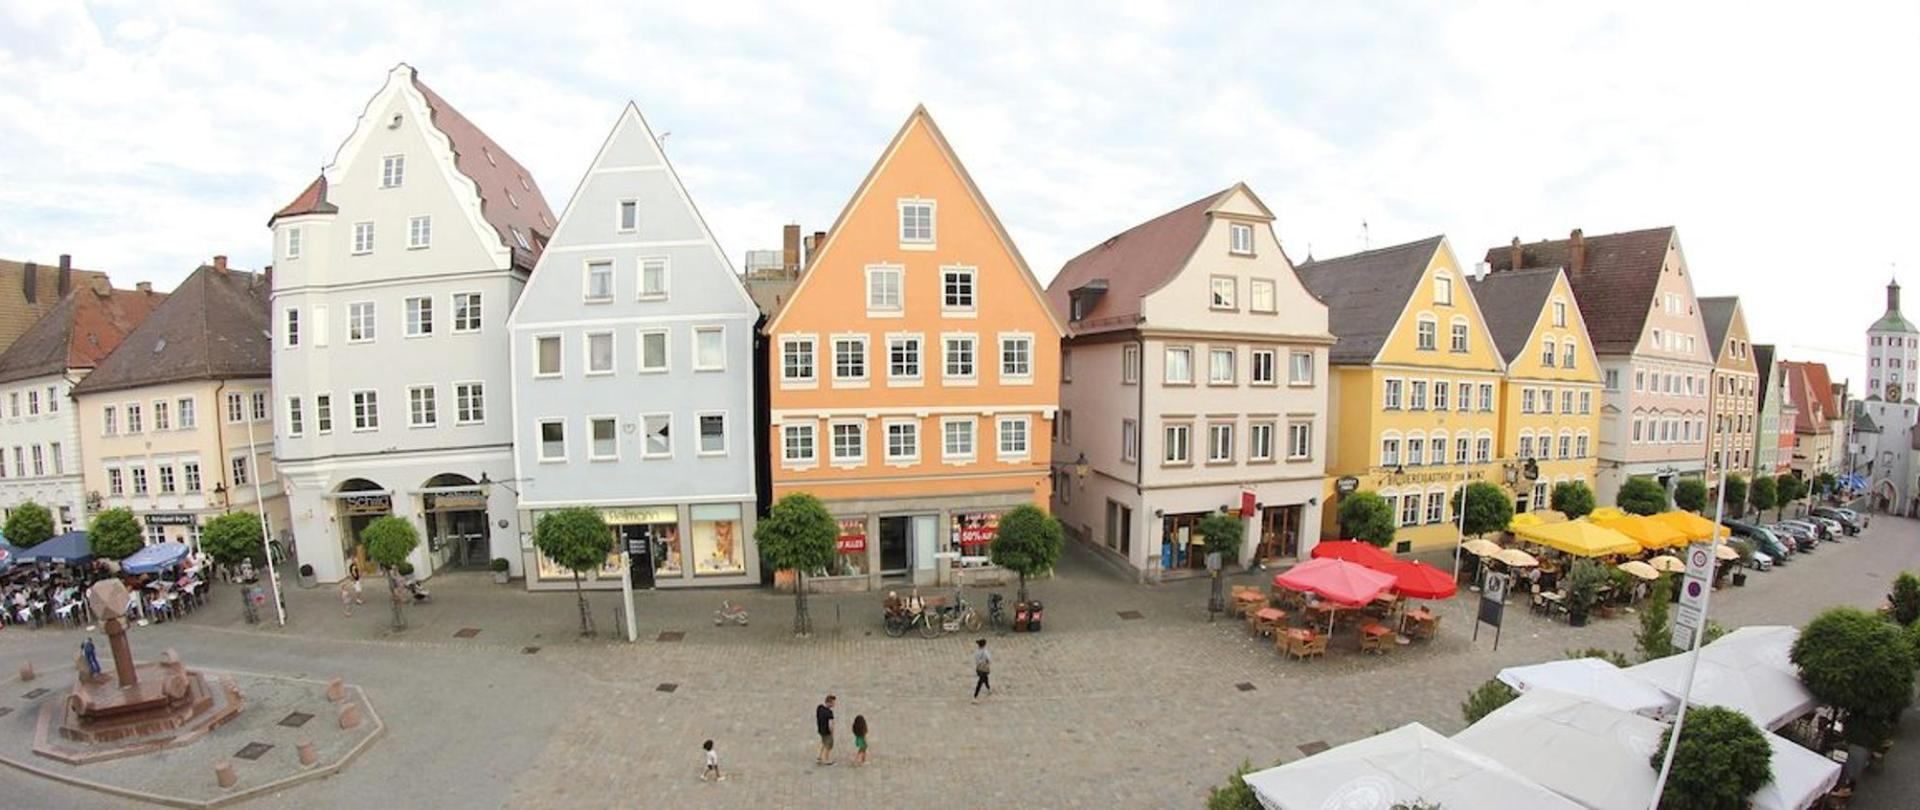 Hotel-Traube-2014-Blick-auf-Marktplatz-2.jpg